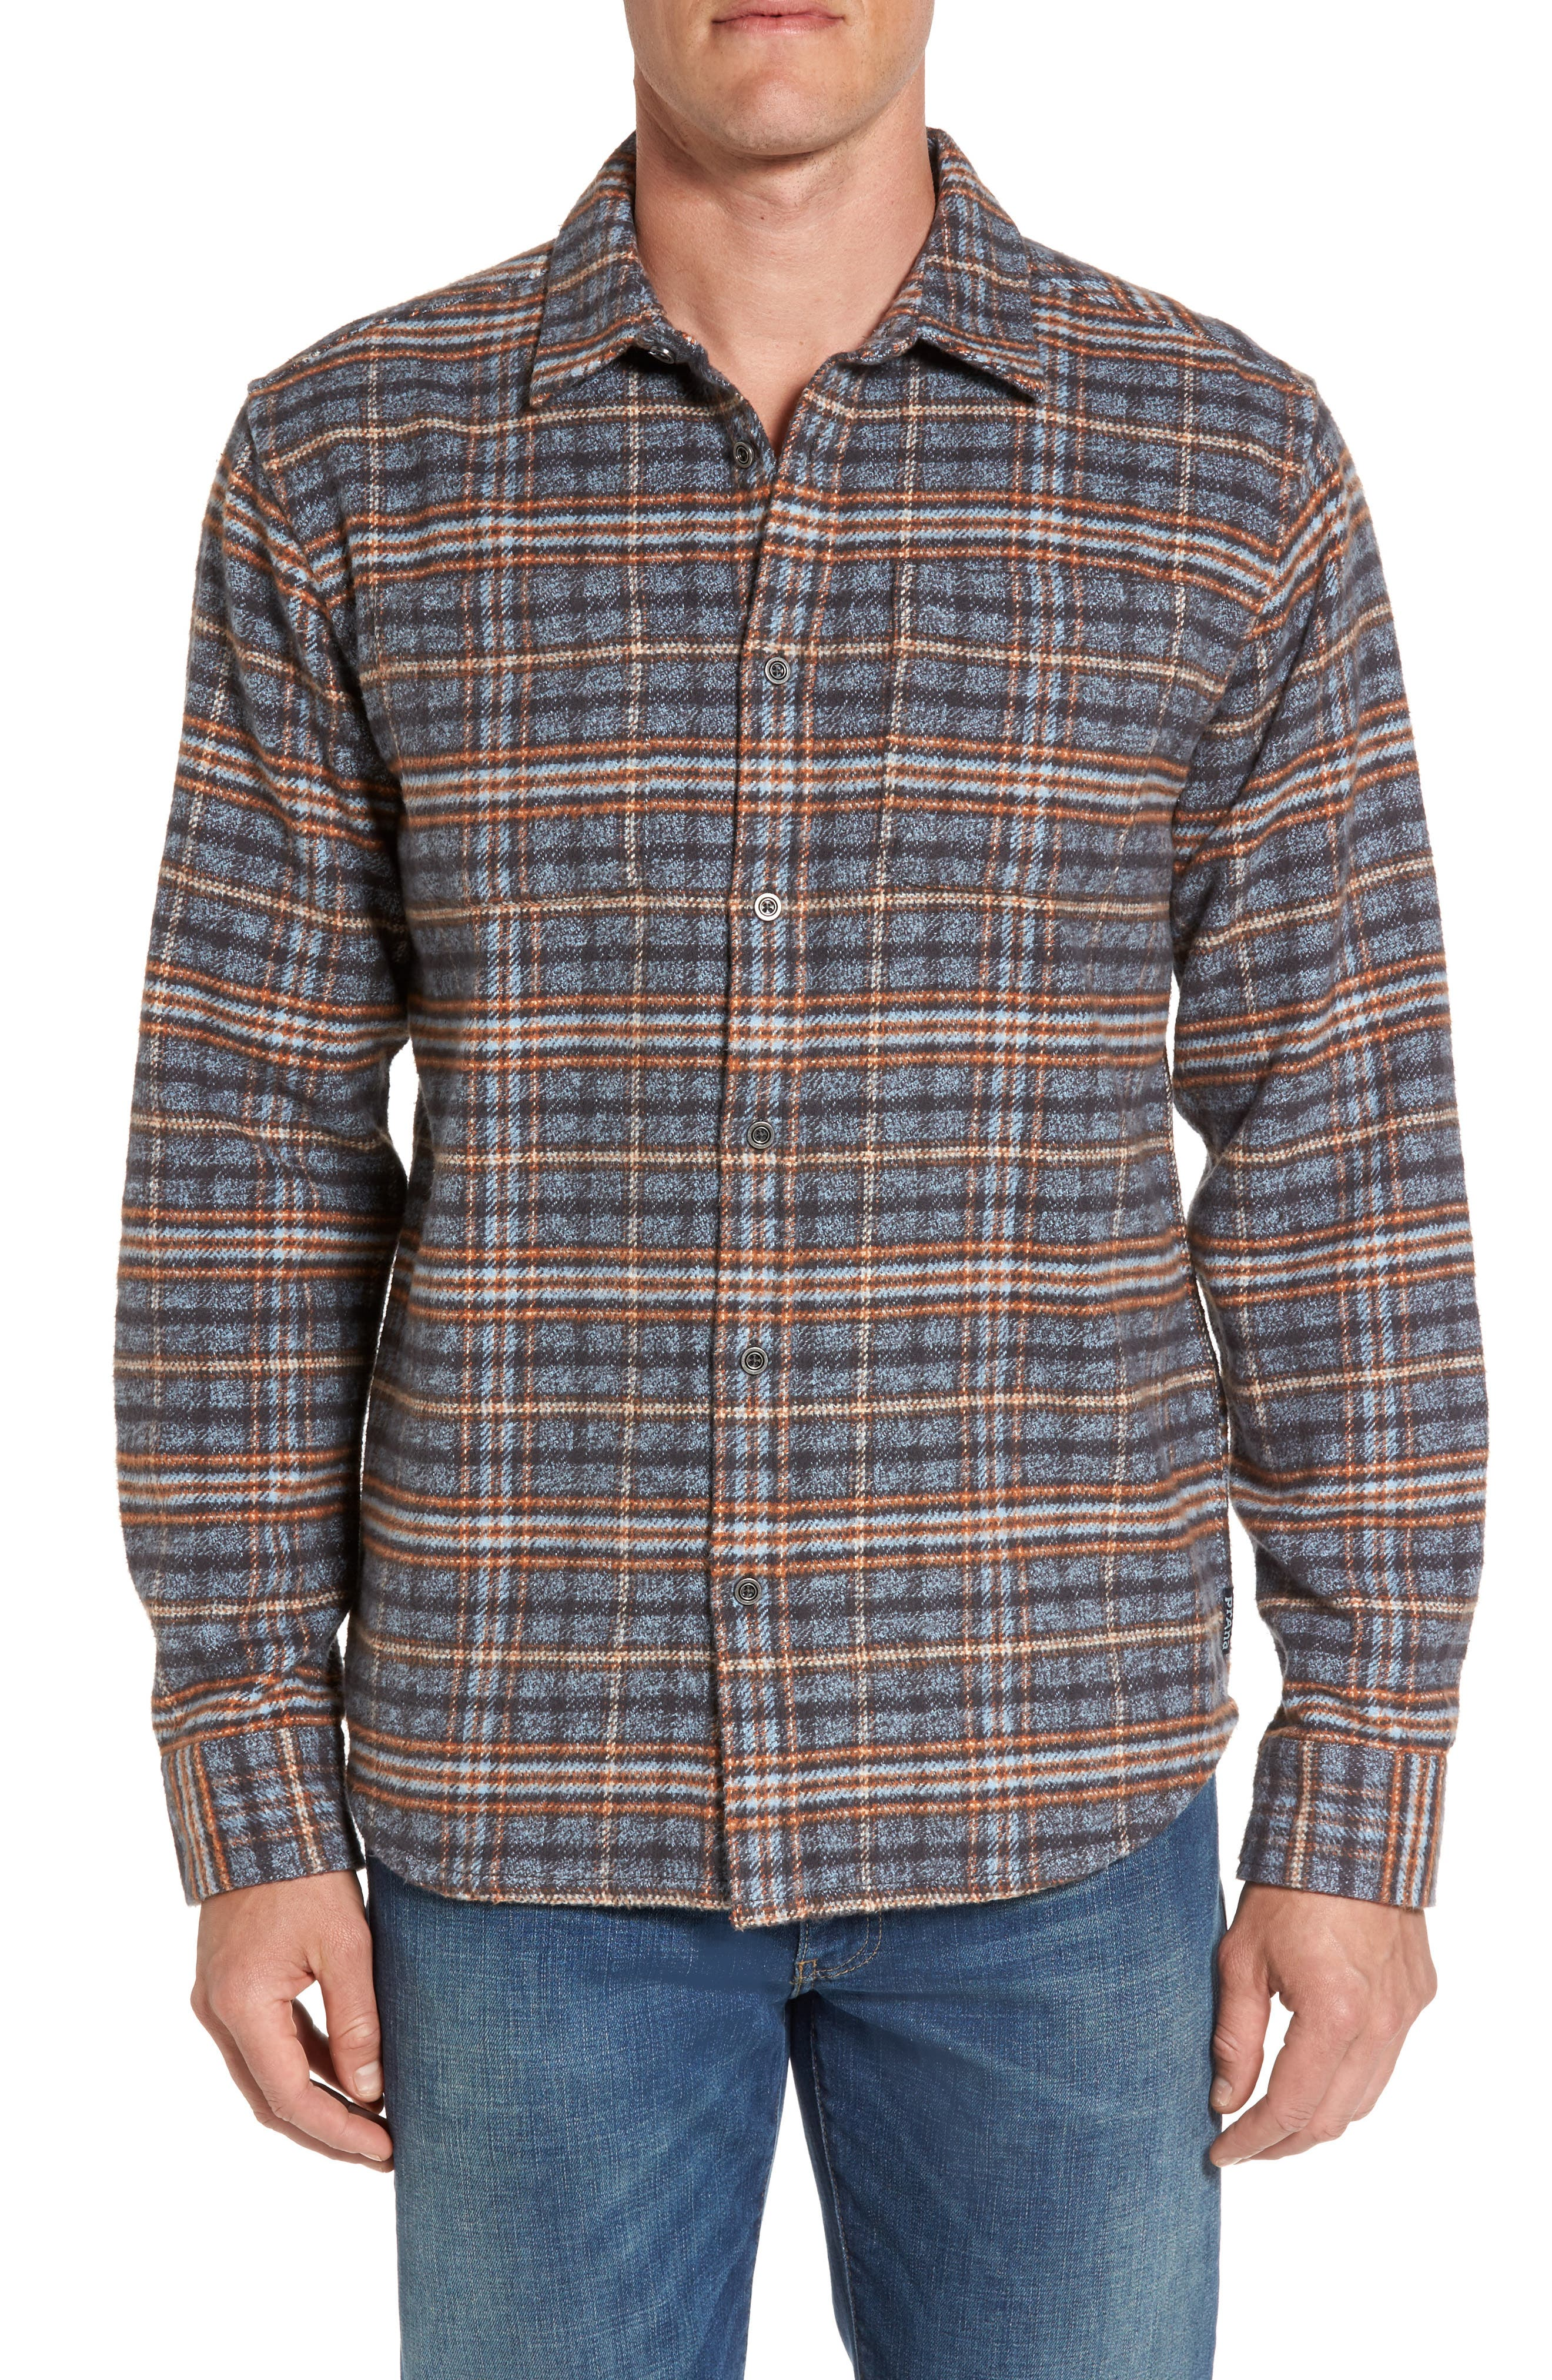 Brayden Regular Fit Plaid Flannel Shirt,                         Main,                         color,